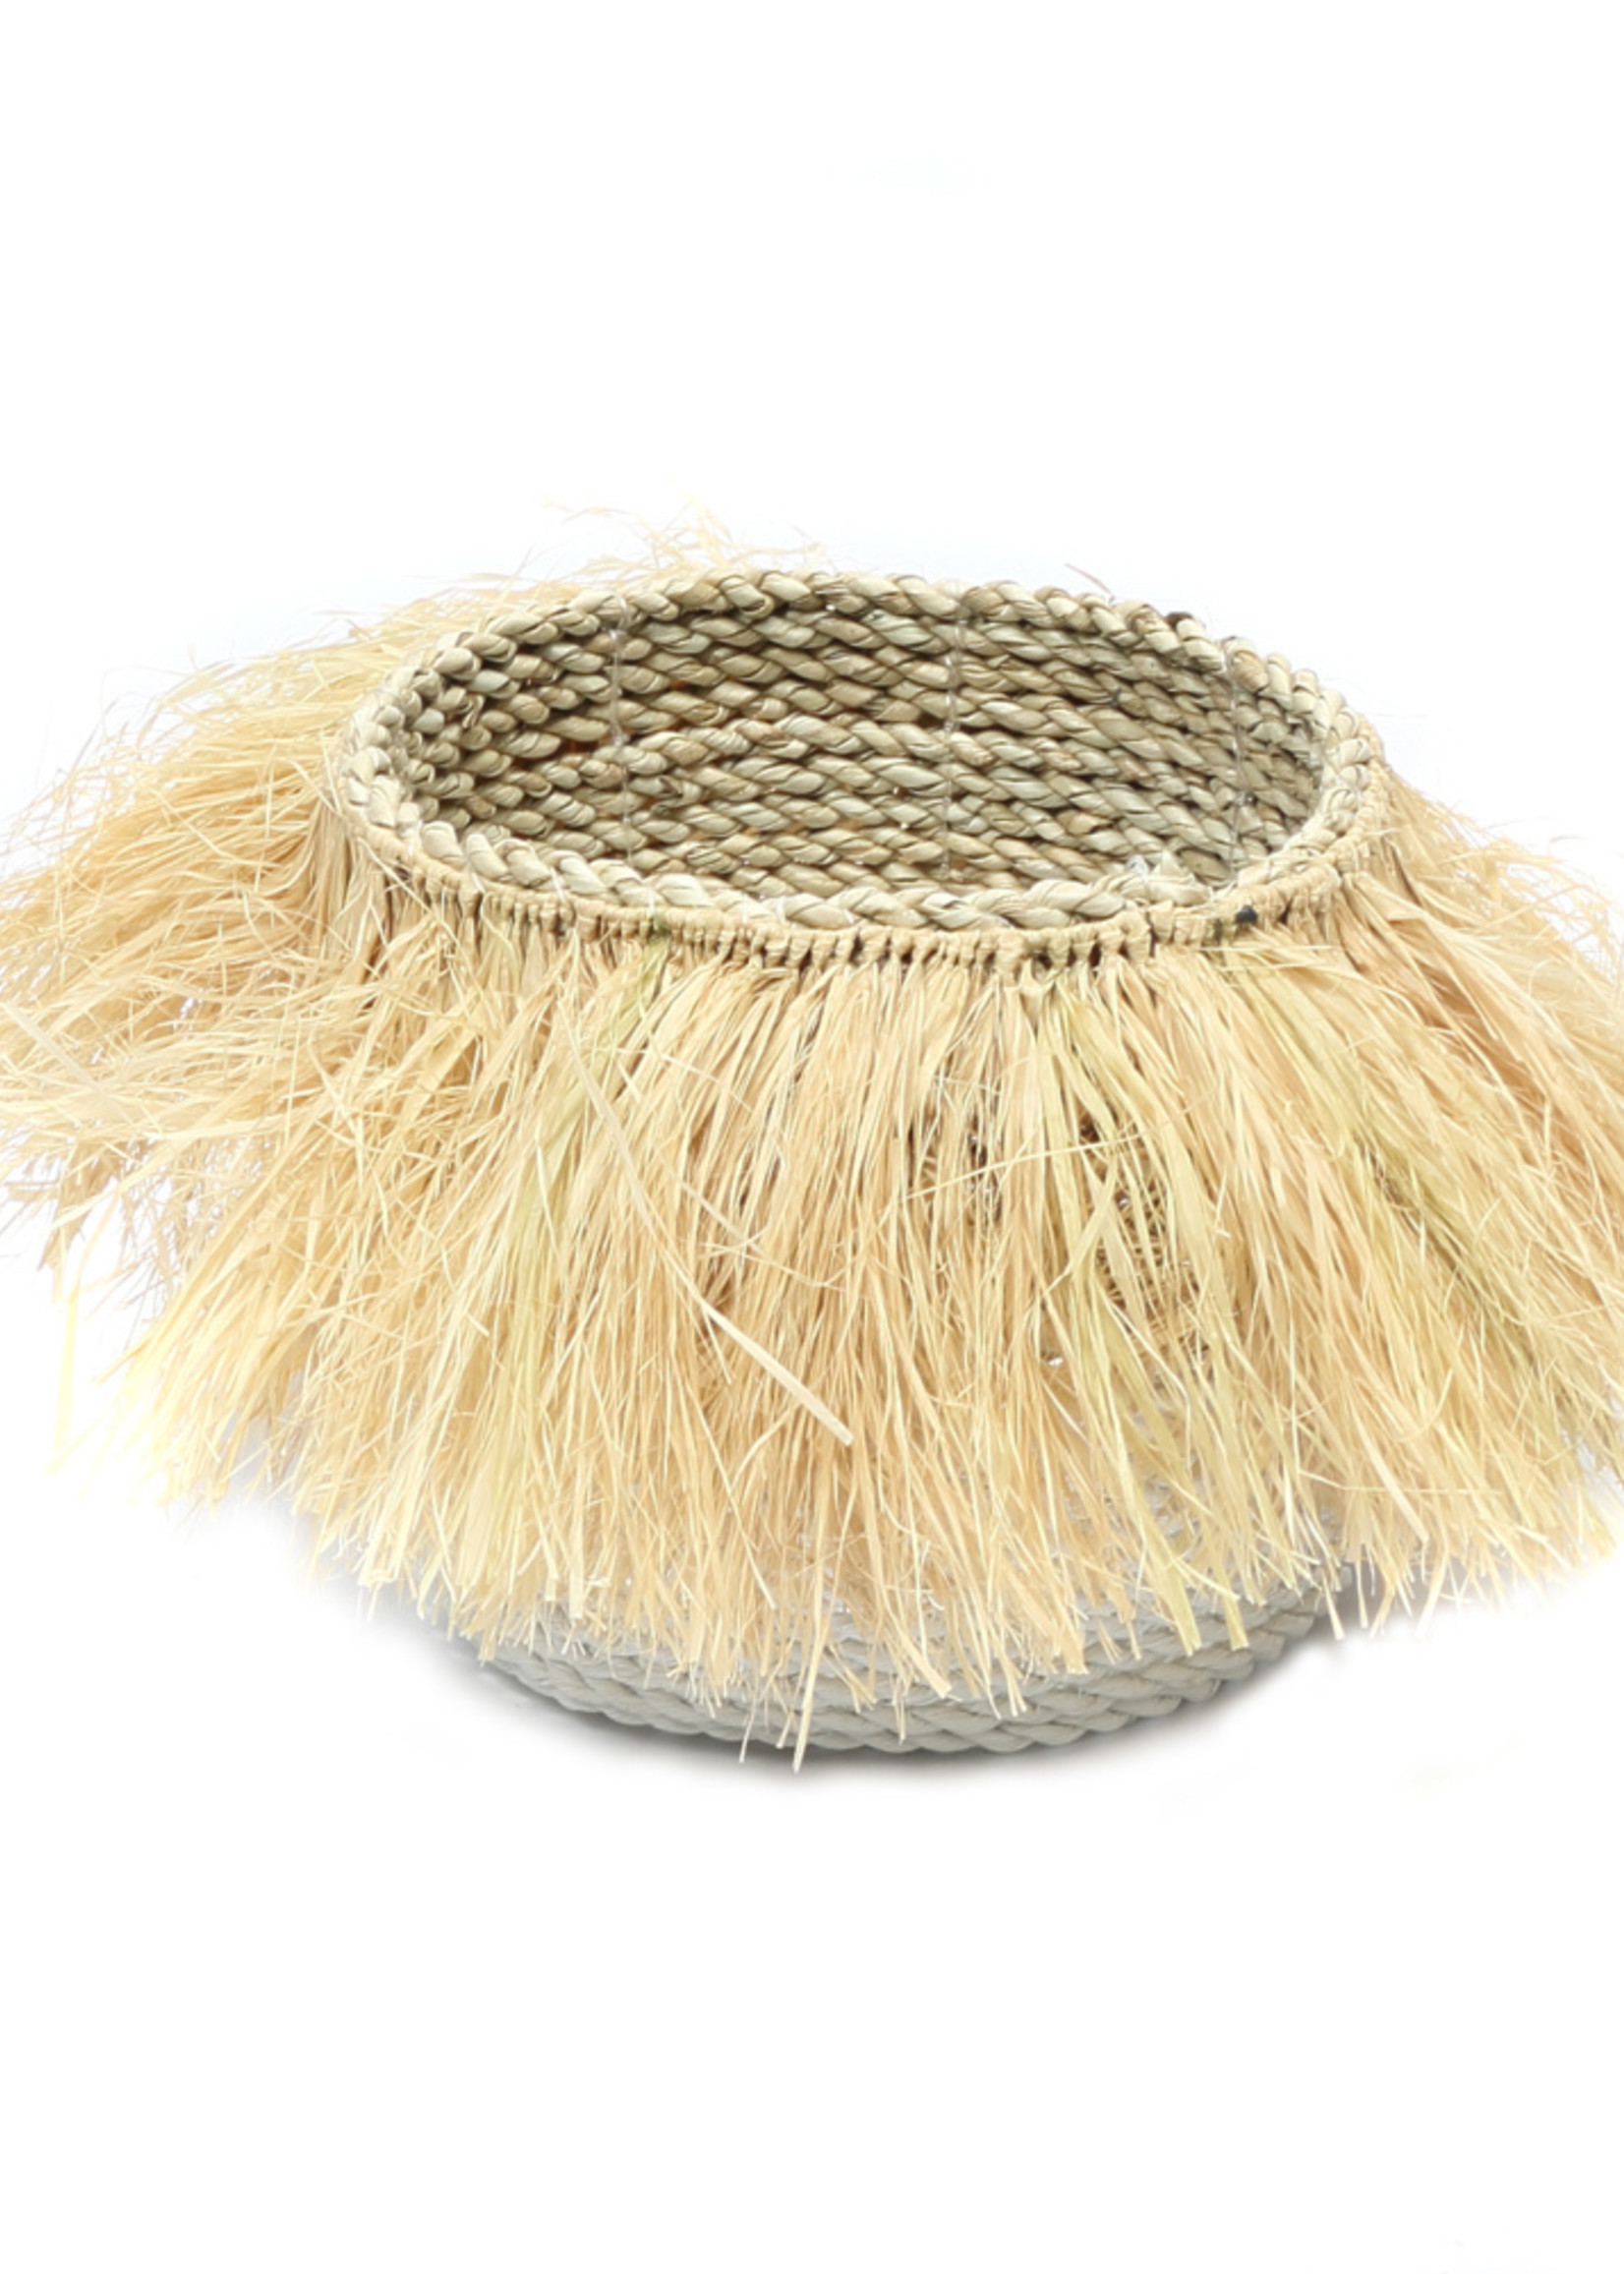 The Aloha Baskets - White Natural - M